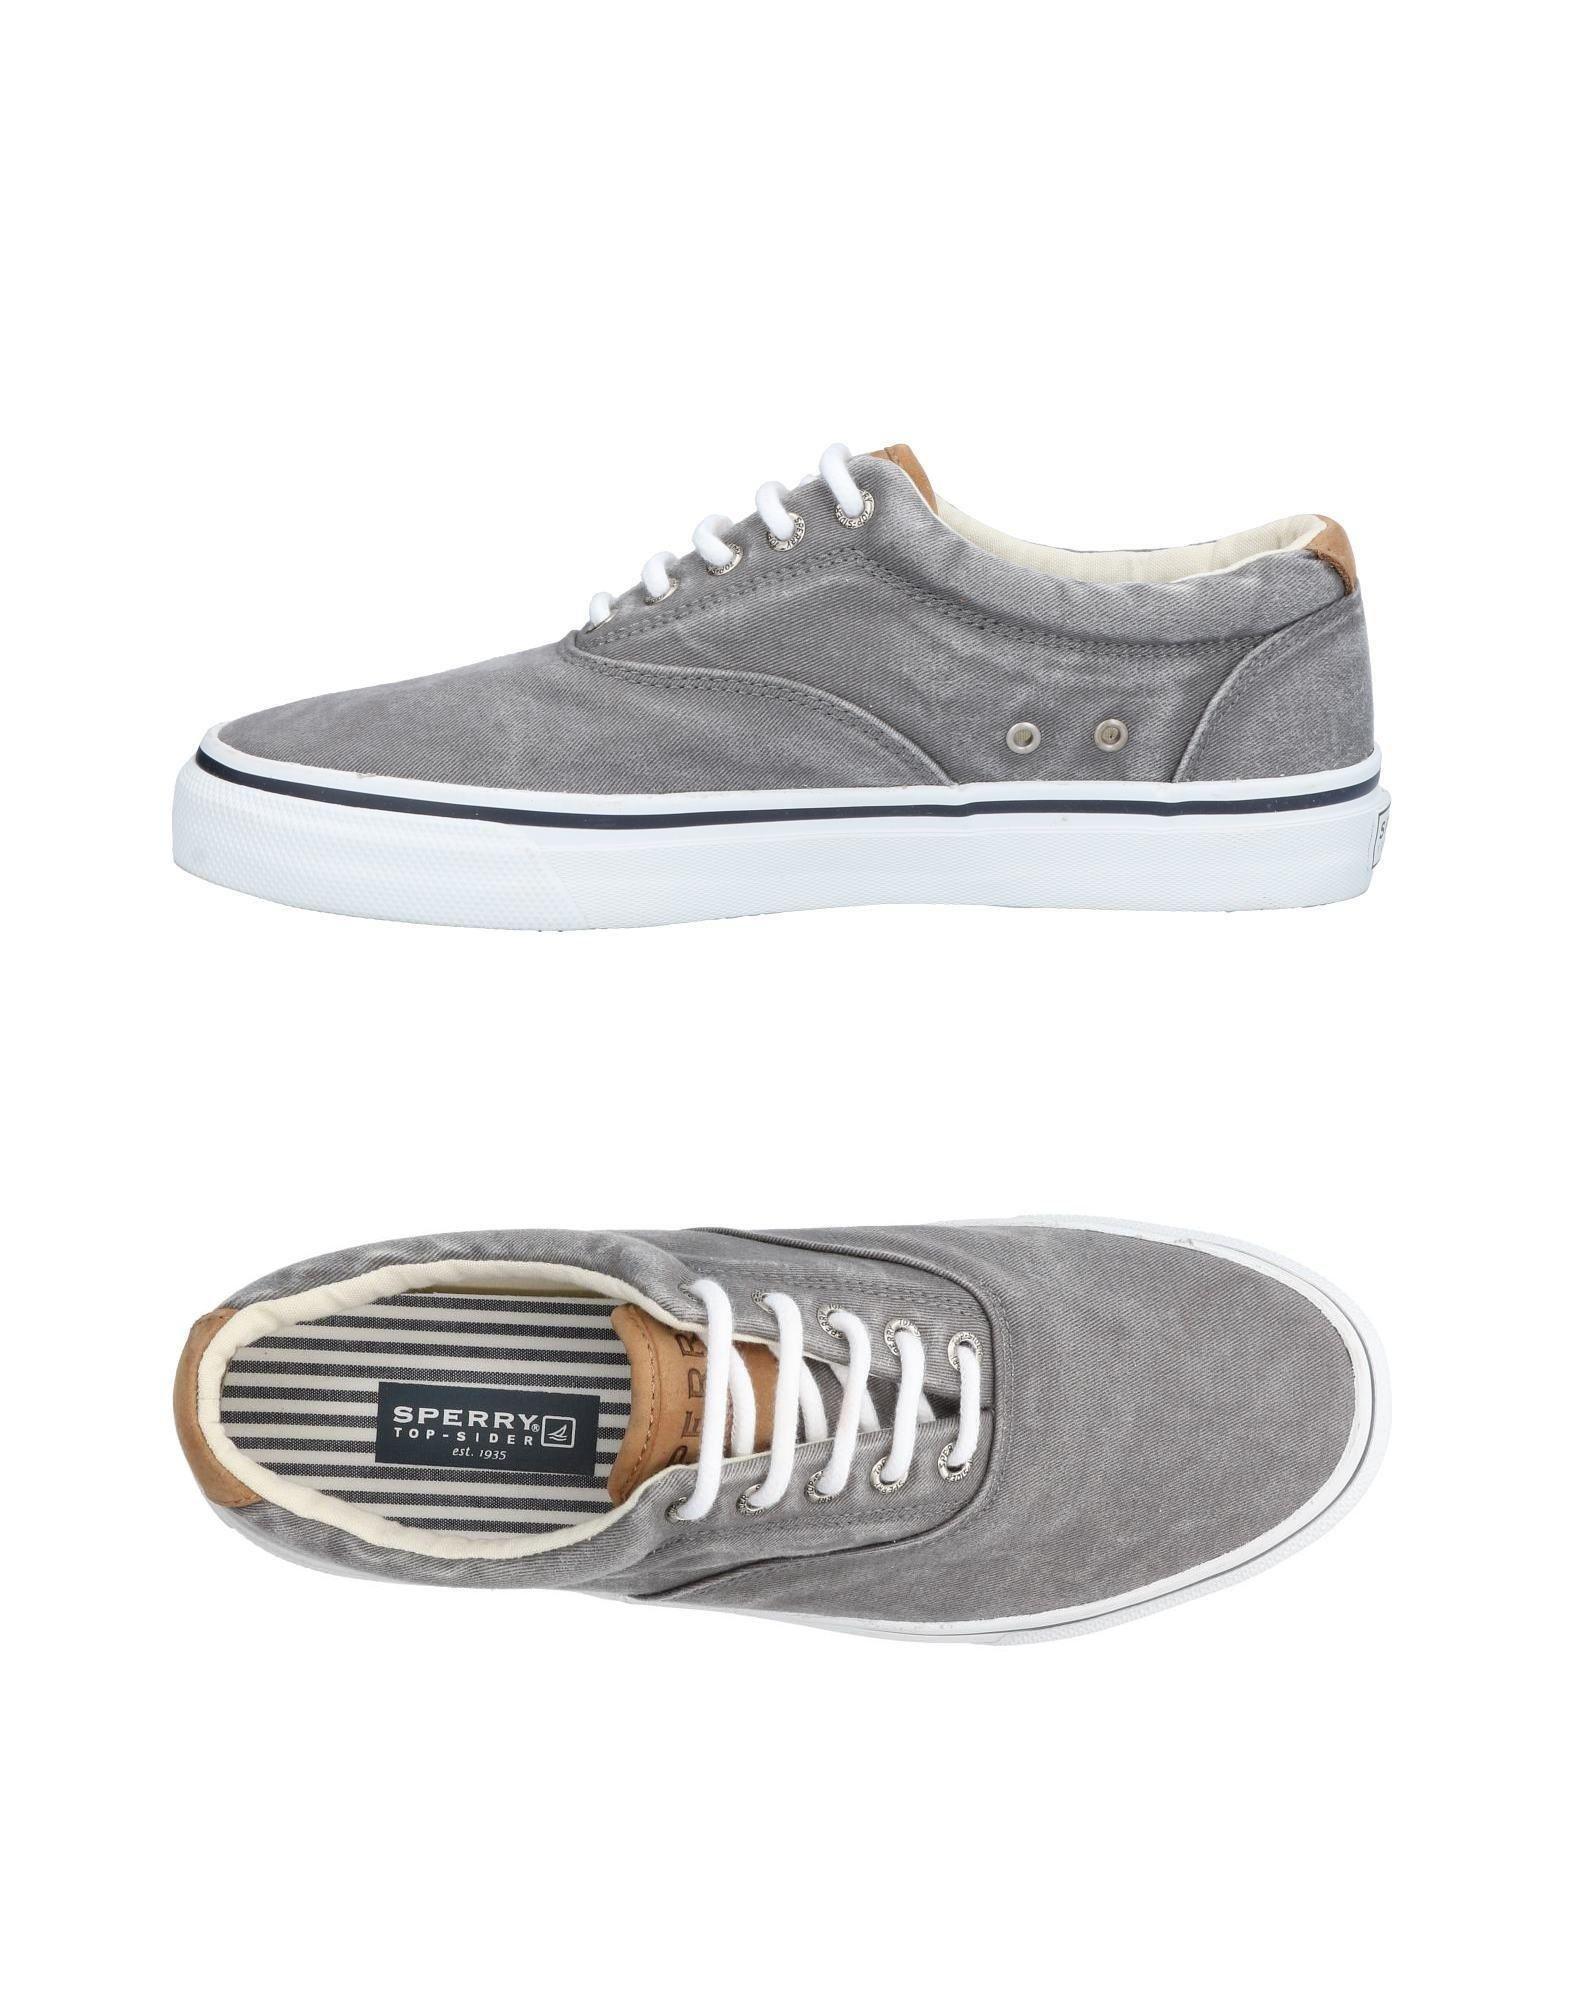 FOOTWEAR - Low-tops & sneakers Sperry Top-Sider NRrSba9O